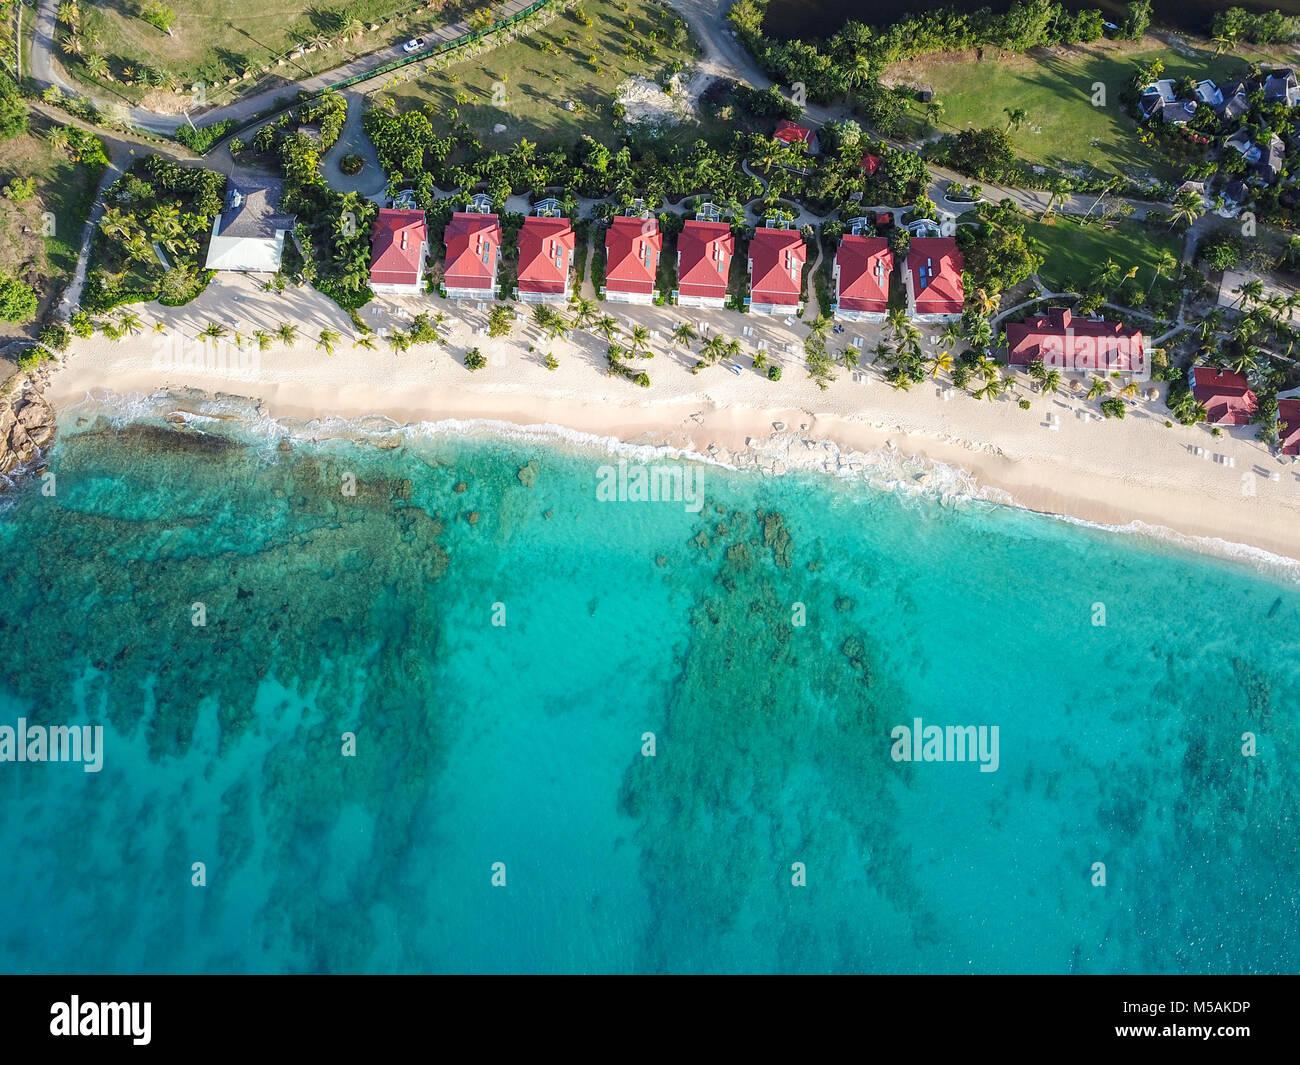 Galley Bay Beach Resort and Spa, Antigua - Stock Image